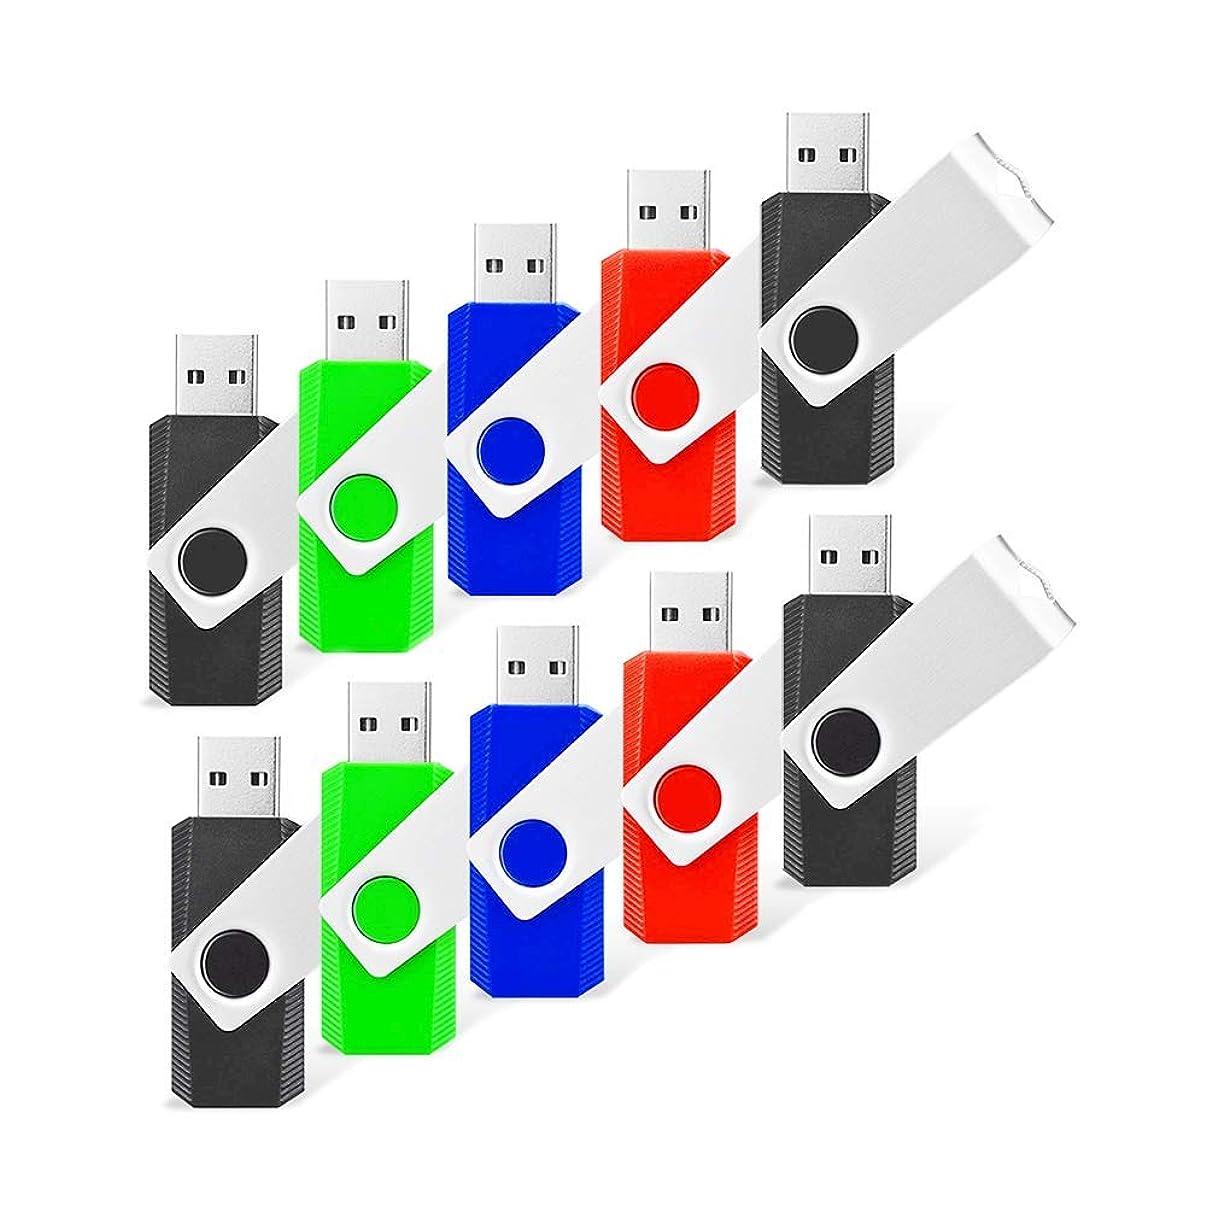 RAOYI 10 Pack 8GB Swivel USB Flash Drive Metal Thumb Drives Pen Drive USB 2.0 Bulk Flash Drive Memory Stick(Black/Red/Blue/Green,4 Mixed Colors)